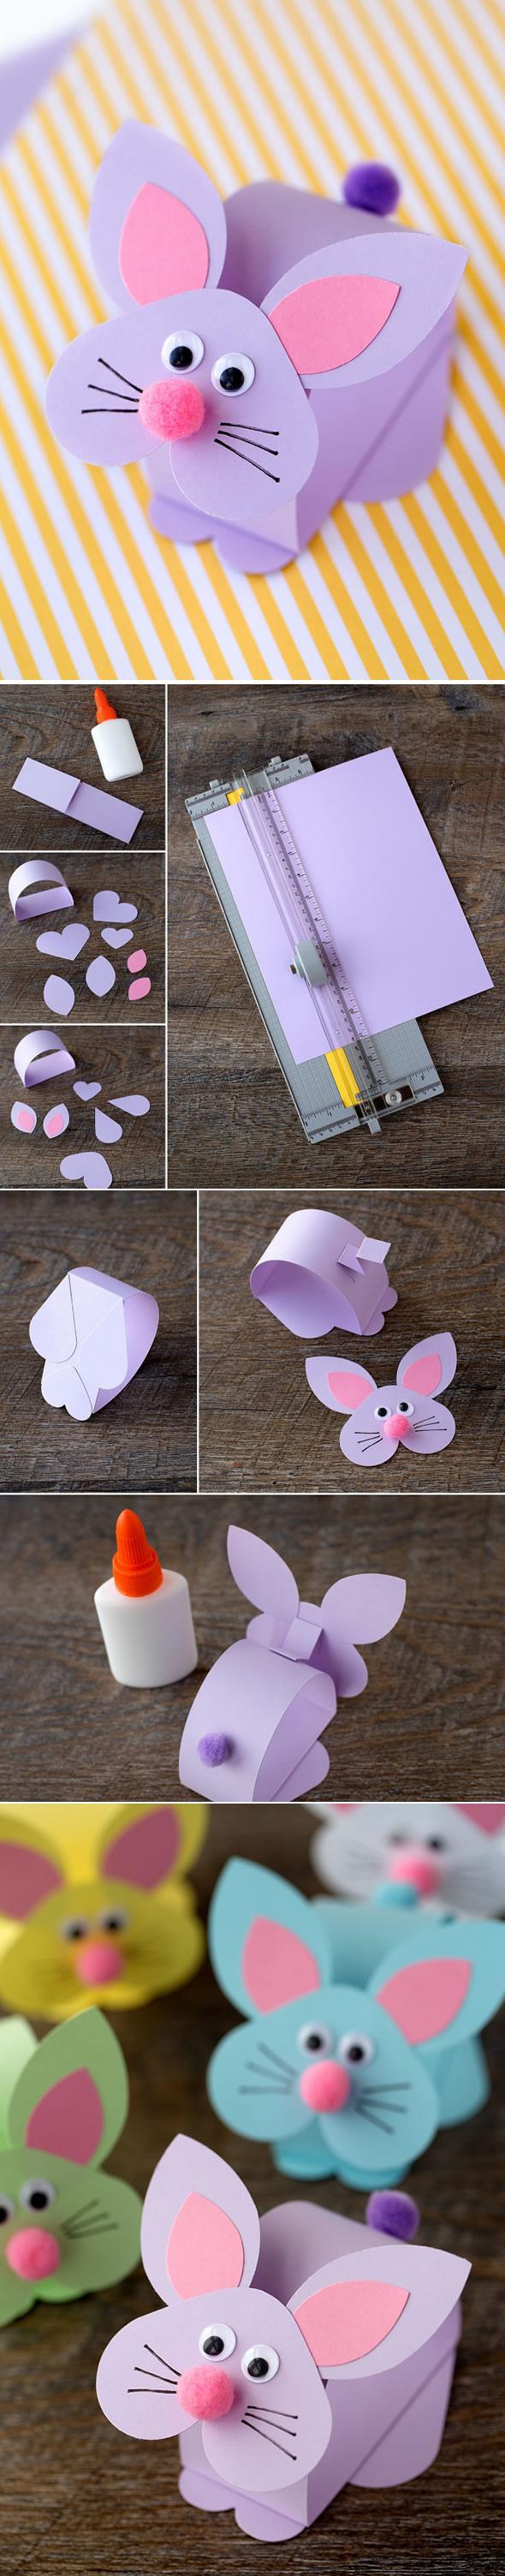 molde coelho papel 8